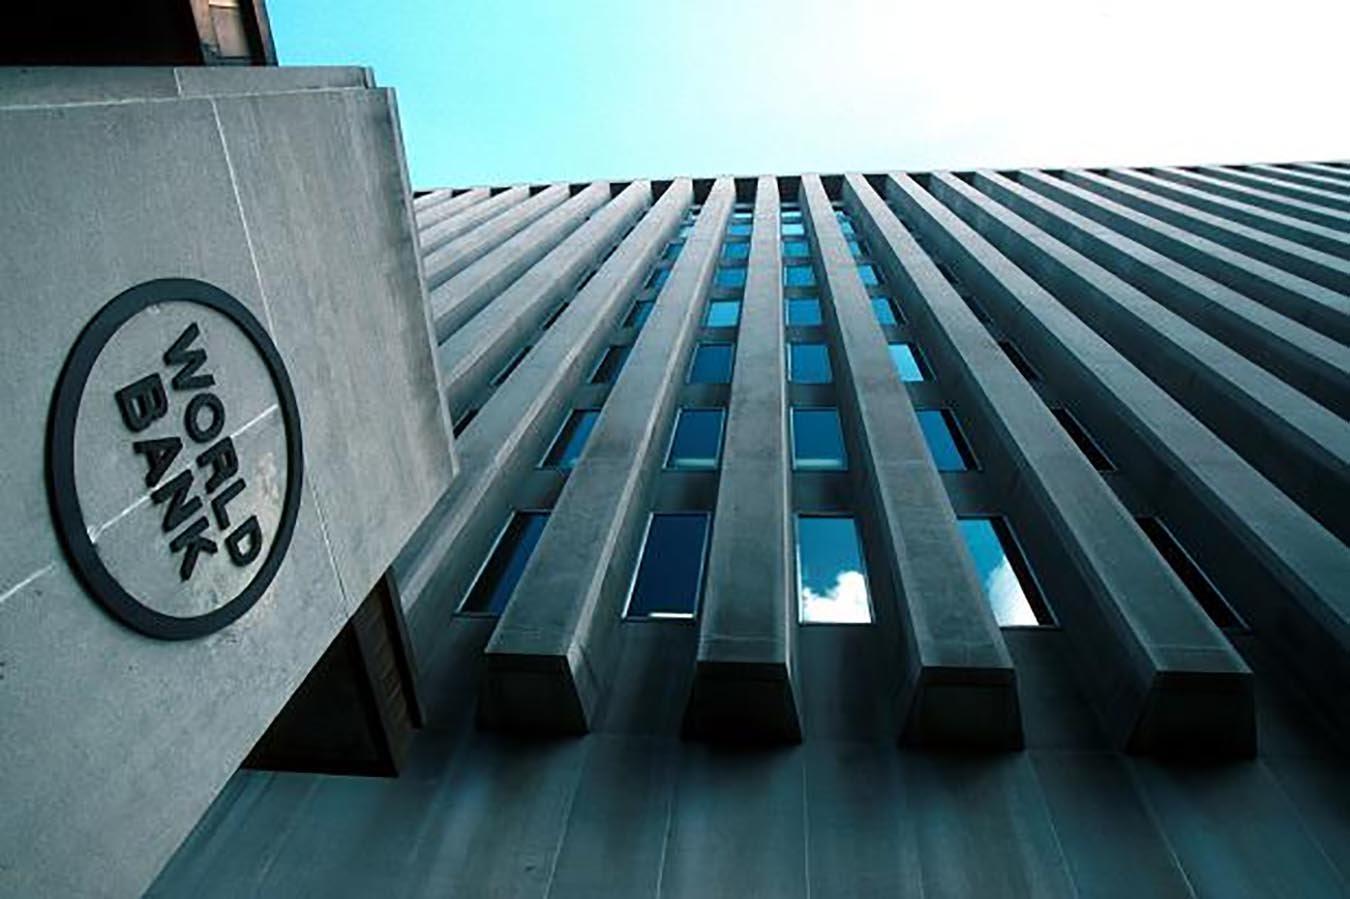 bangladesh global poverty reduction model world bank